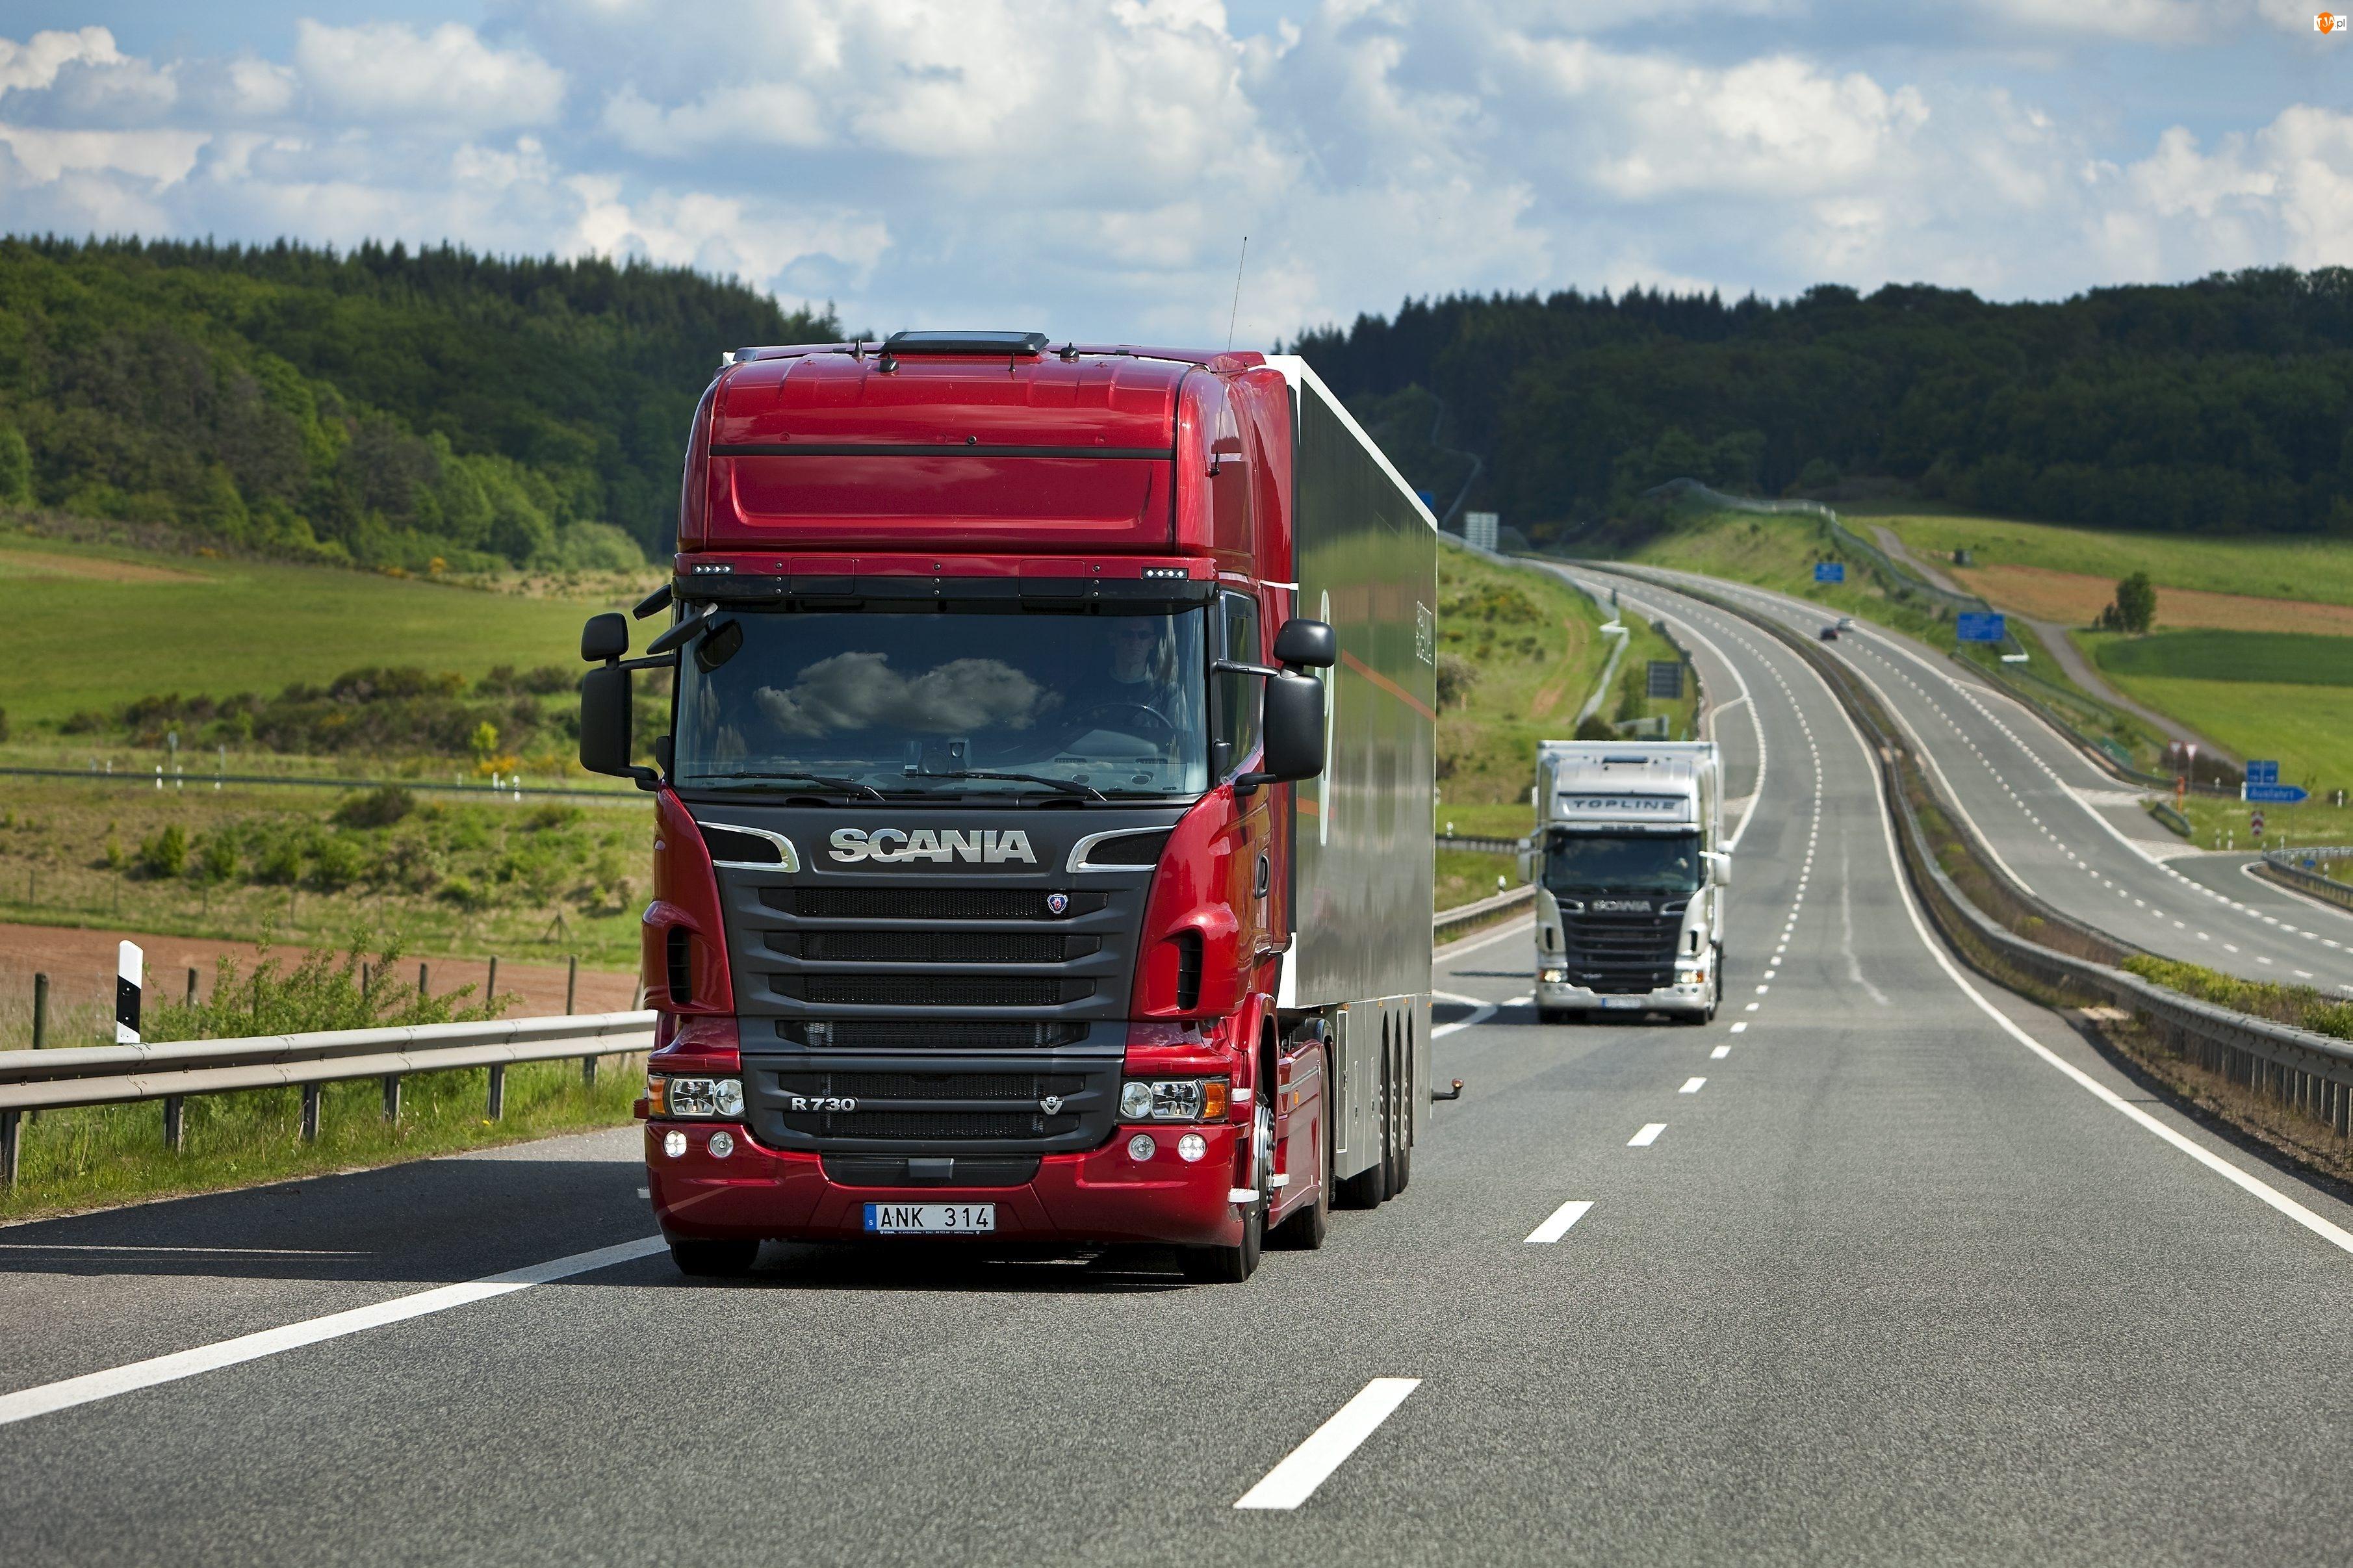 R730, Scania, Ciężarówka